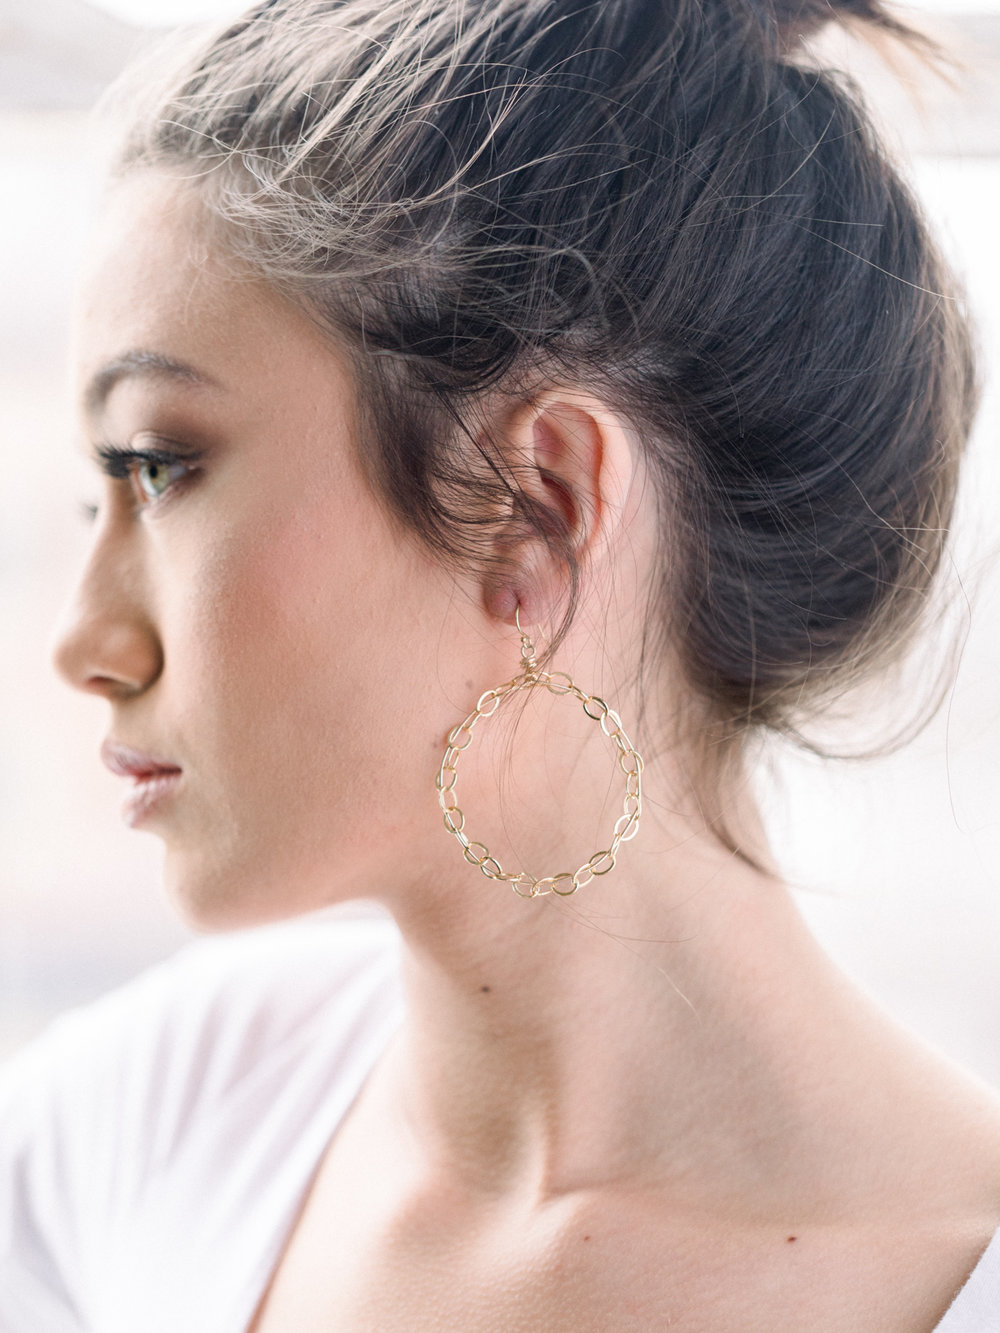 190217-0027-Rachelle-Celine-Handmade-Jewelry-DC-Elisenda-Llinares